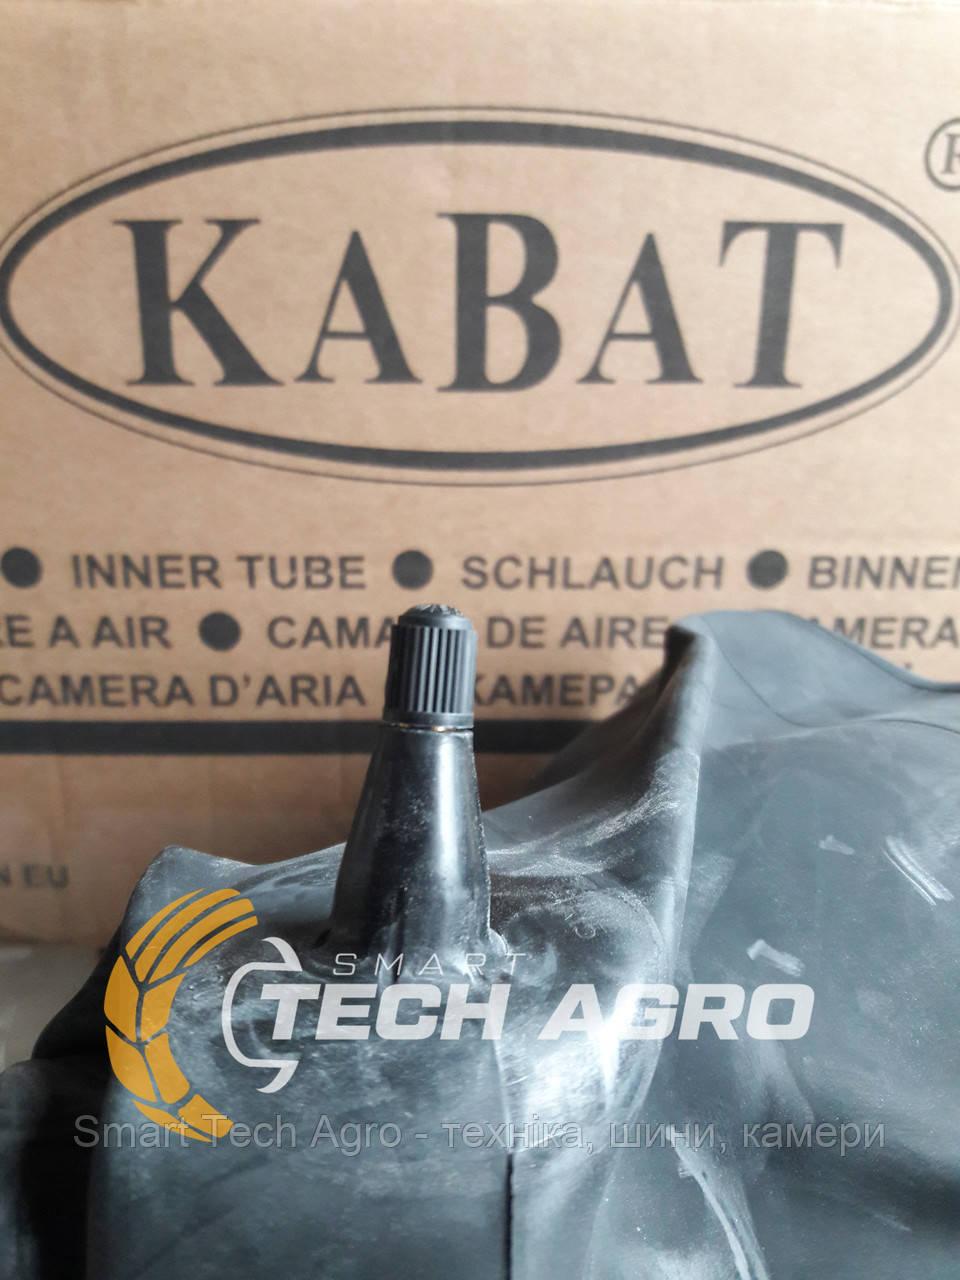 Камера  400/60 15.5 TR-15 Kabat для причепа борони плуга культиватора 350/70 15.5, камера 15.5